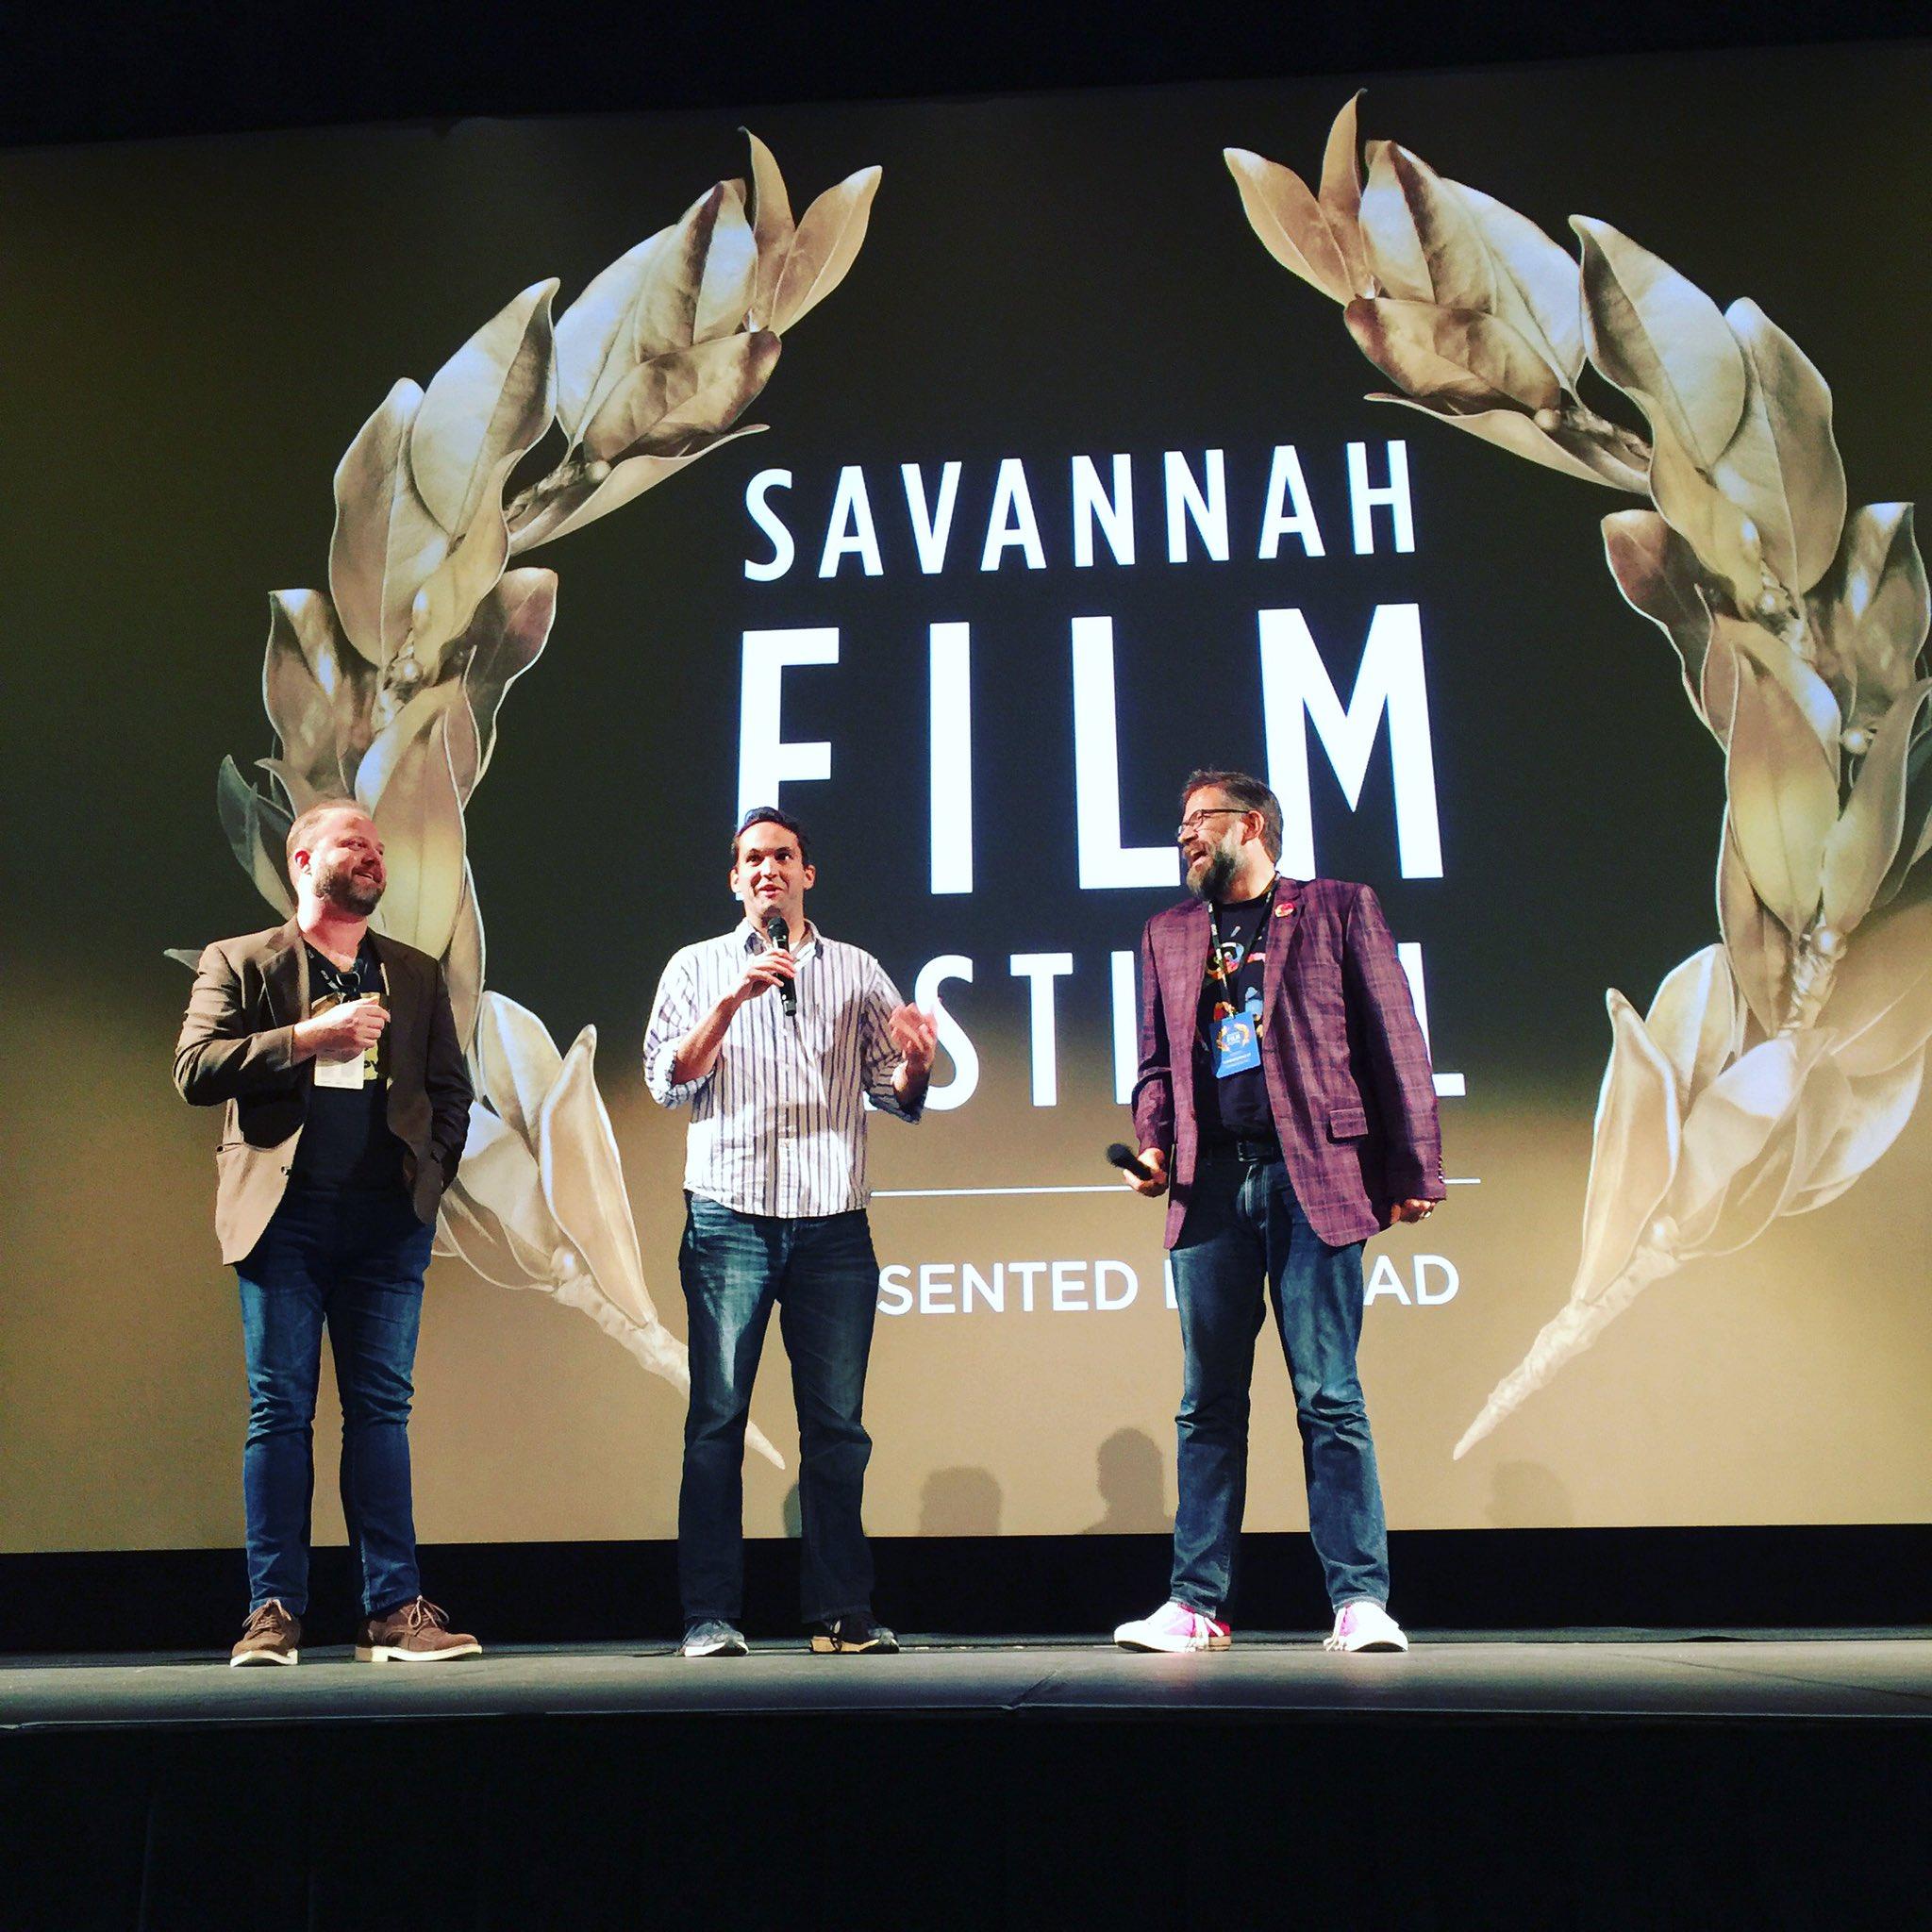 Q & A with Porkchop, Denton and Michael at @savfilmfest. #SavFF https://t.co/Ffj6No42Bu